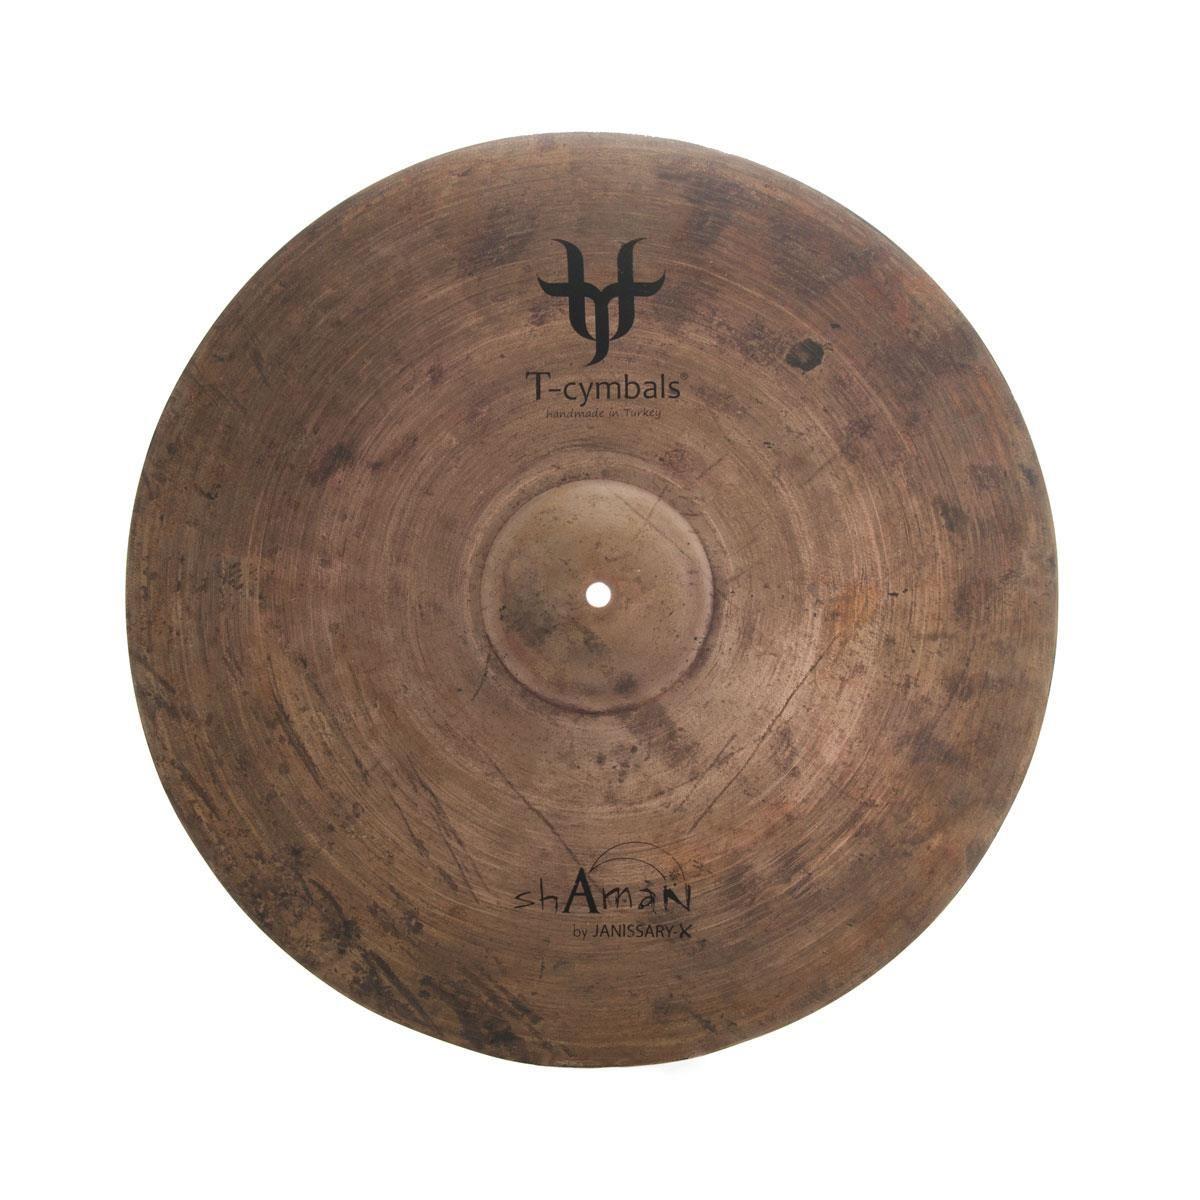 "Piatto T-Cymbals 17"" Janissary-x Shaman"